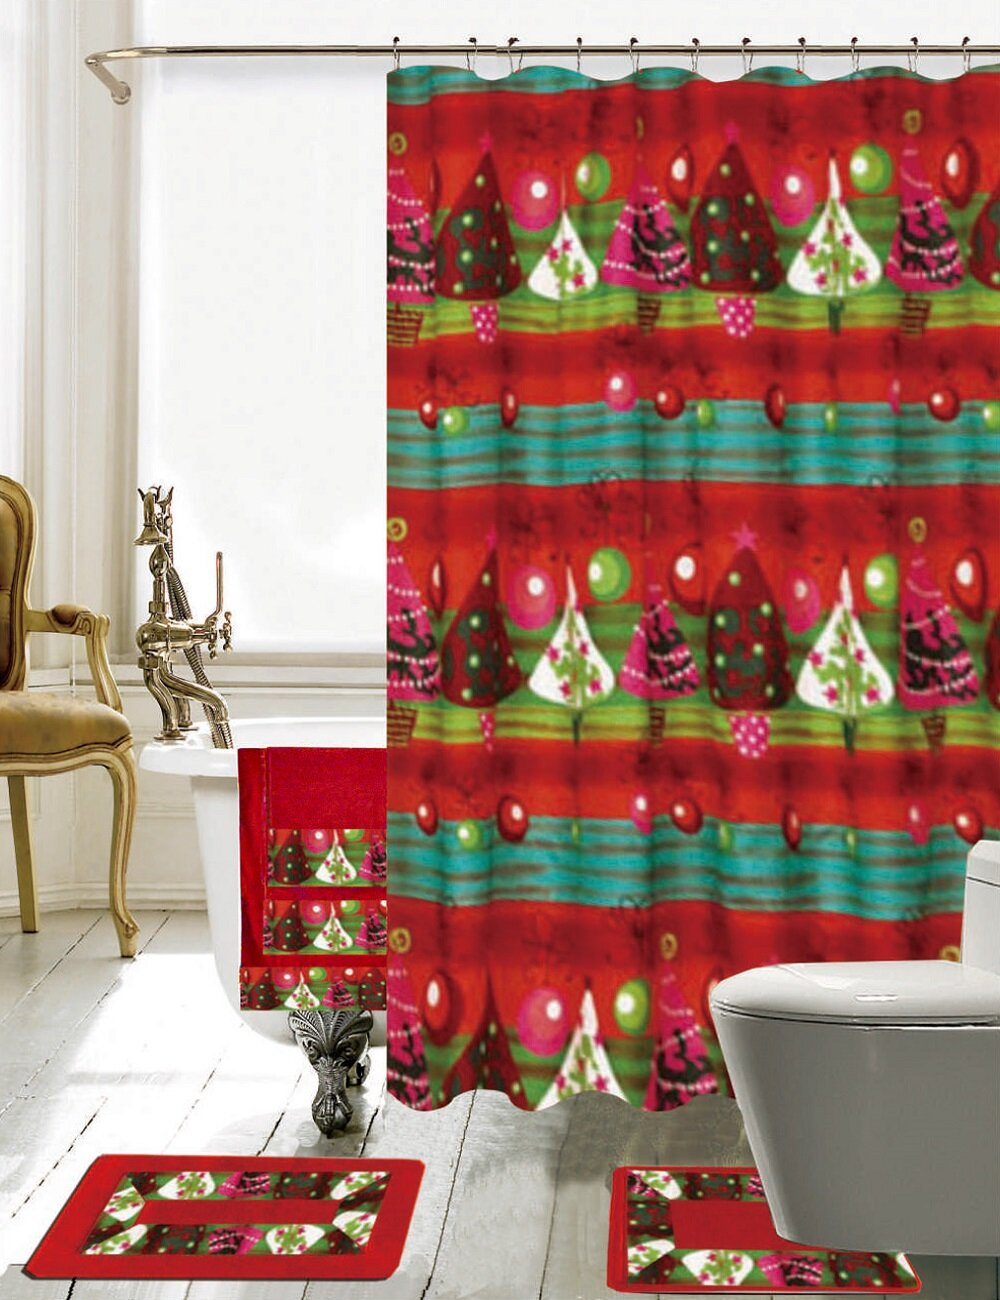 The Holiday Aisle Christmas Bathroom Decor 18 Piece Bath Set Hooks Reviews Wayfair